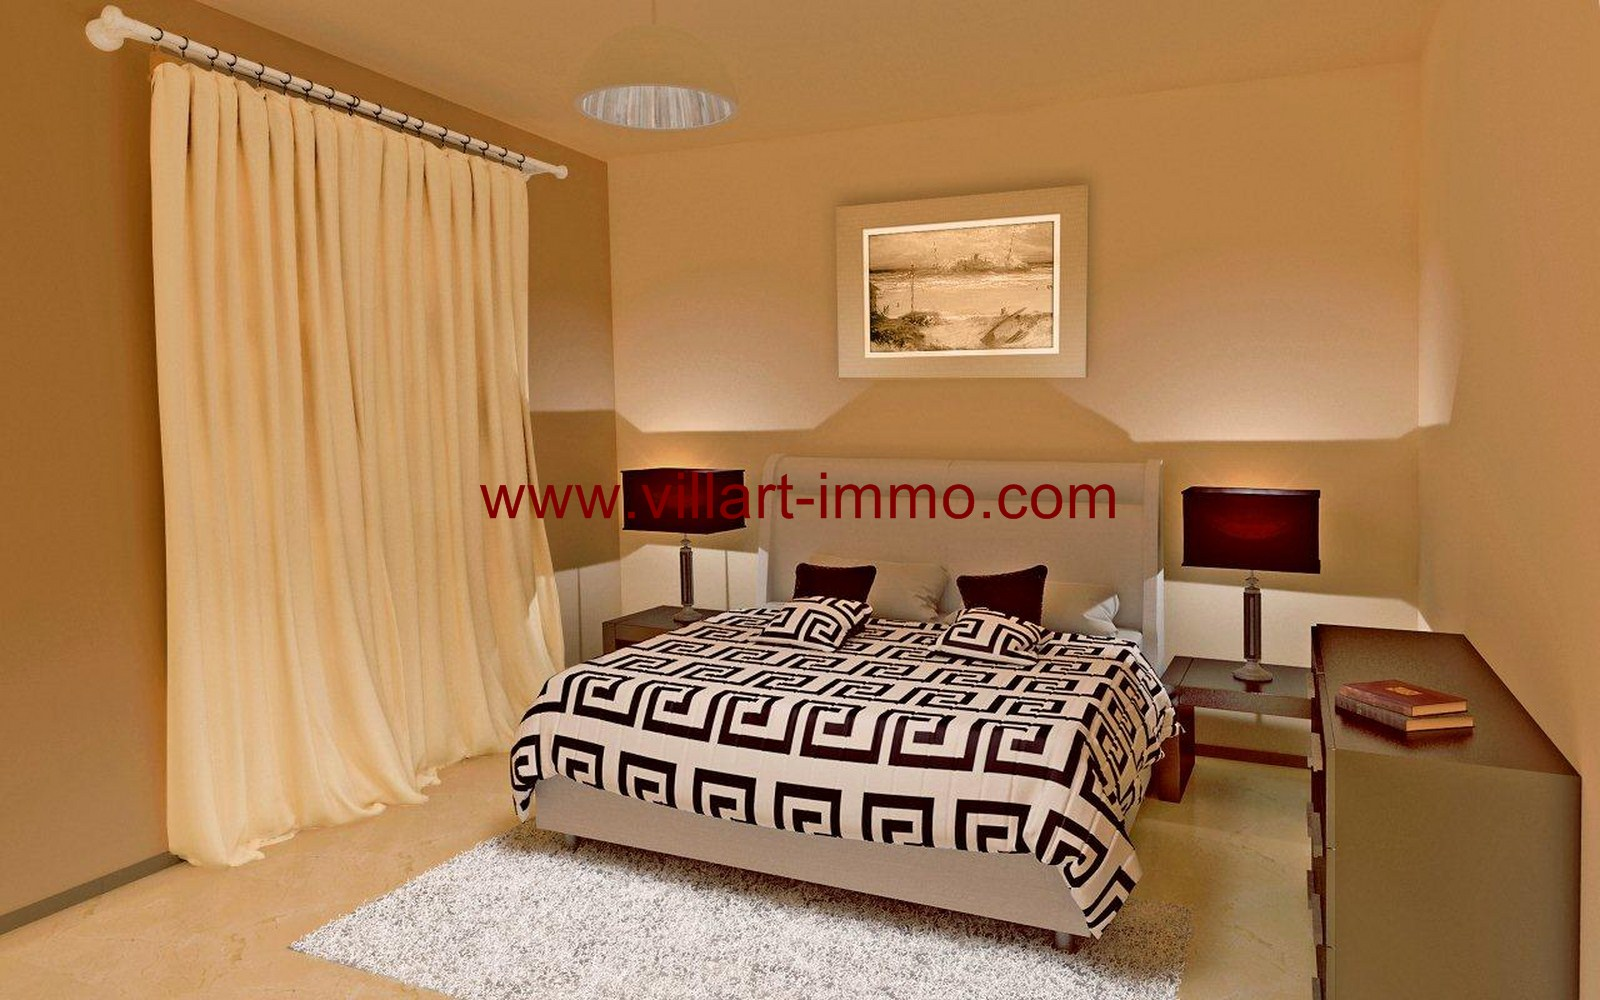 7-Vente-Appartement-Tanger-Centre-ville-SHAZ-Villart Immo